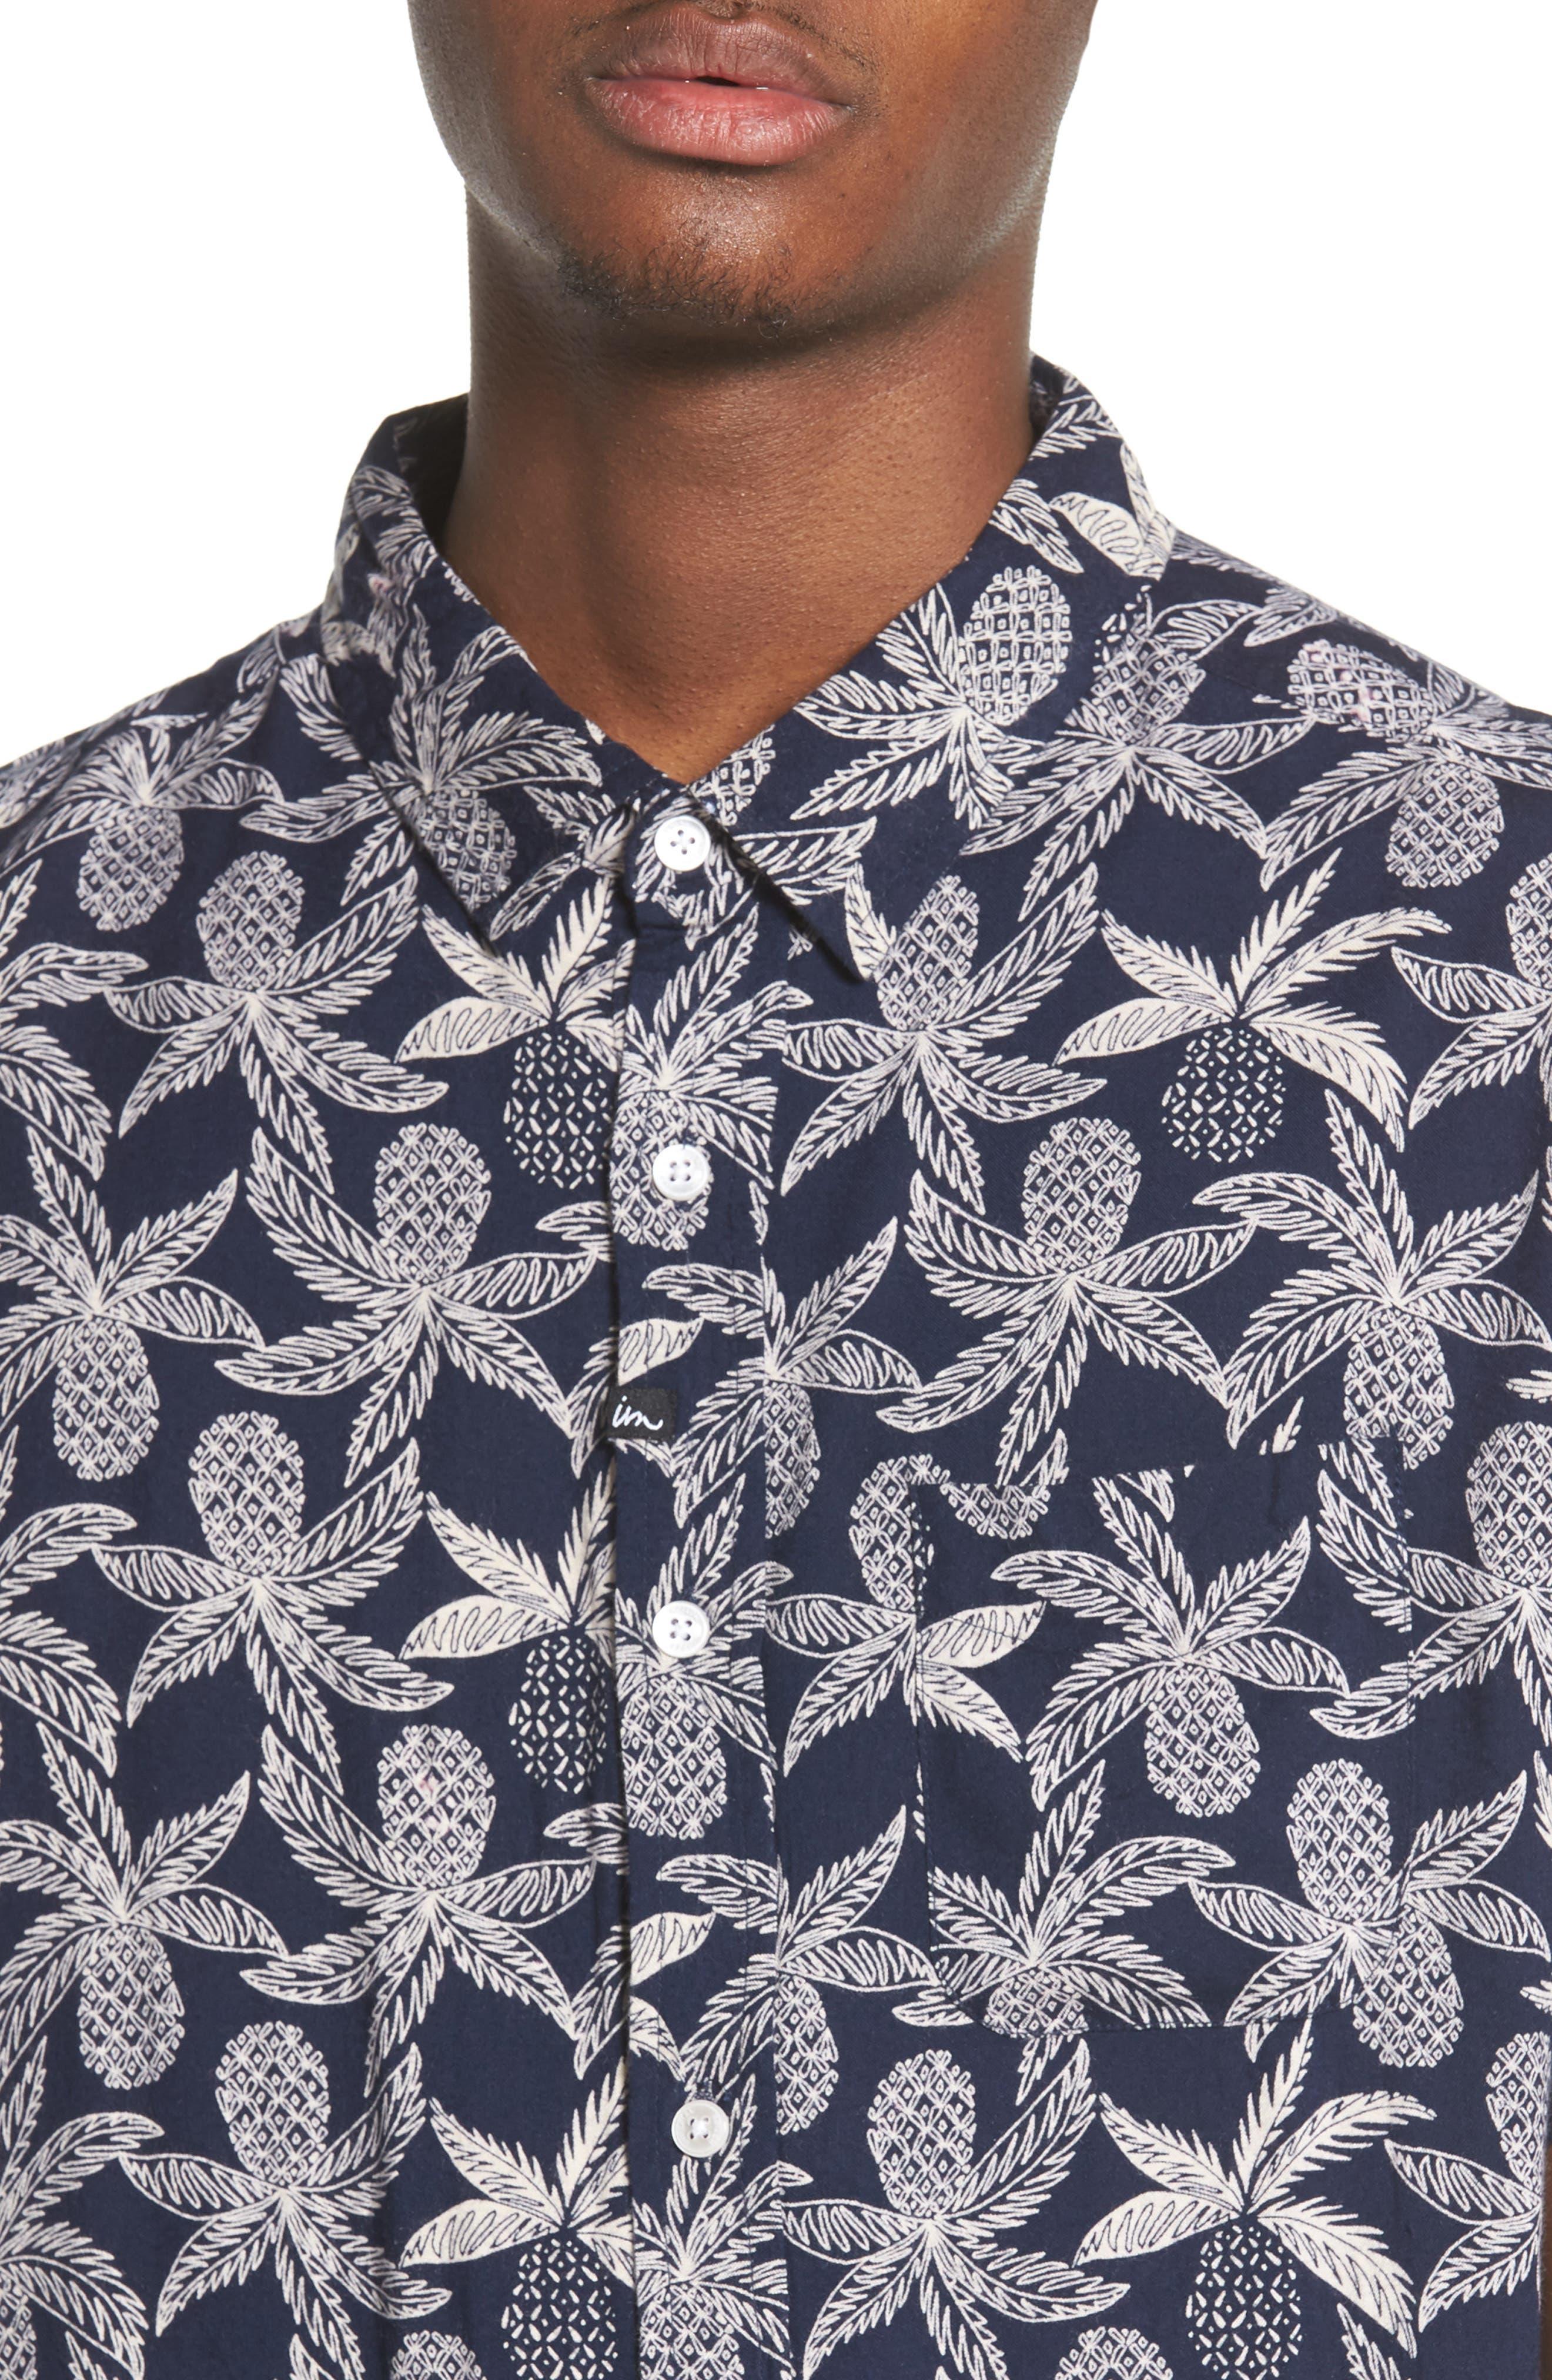 Vacay Woven Shirt,                             Alternate thumbnail 2, color,                             Navy Multi